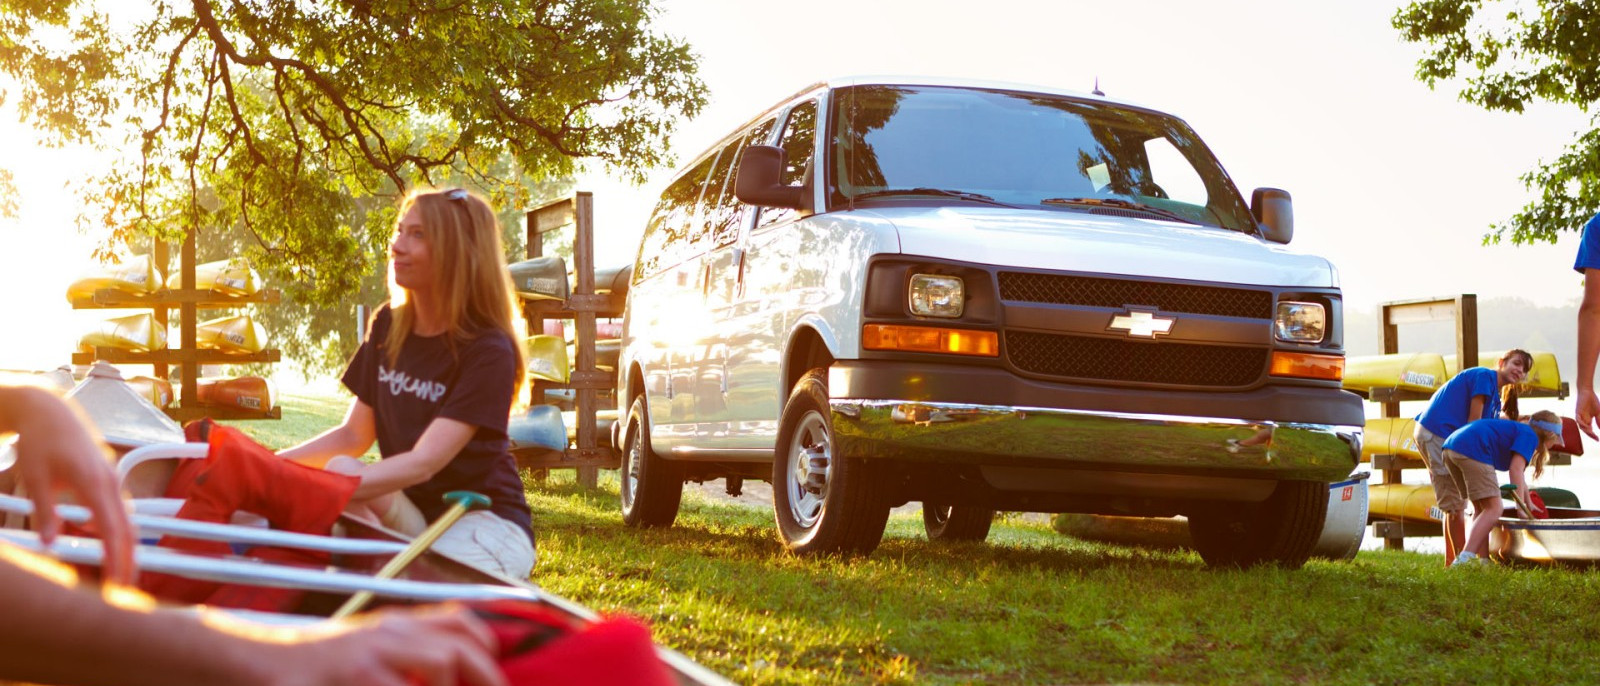 2014 Chevrolet Express Exterior in park white van